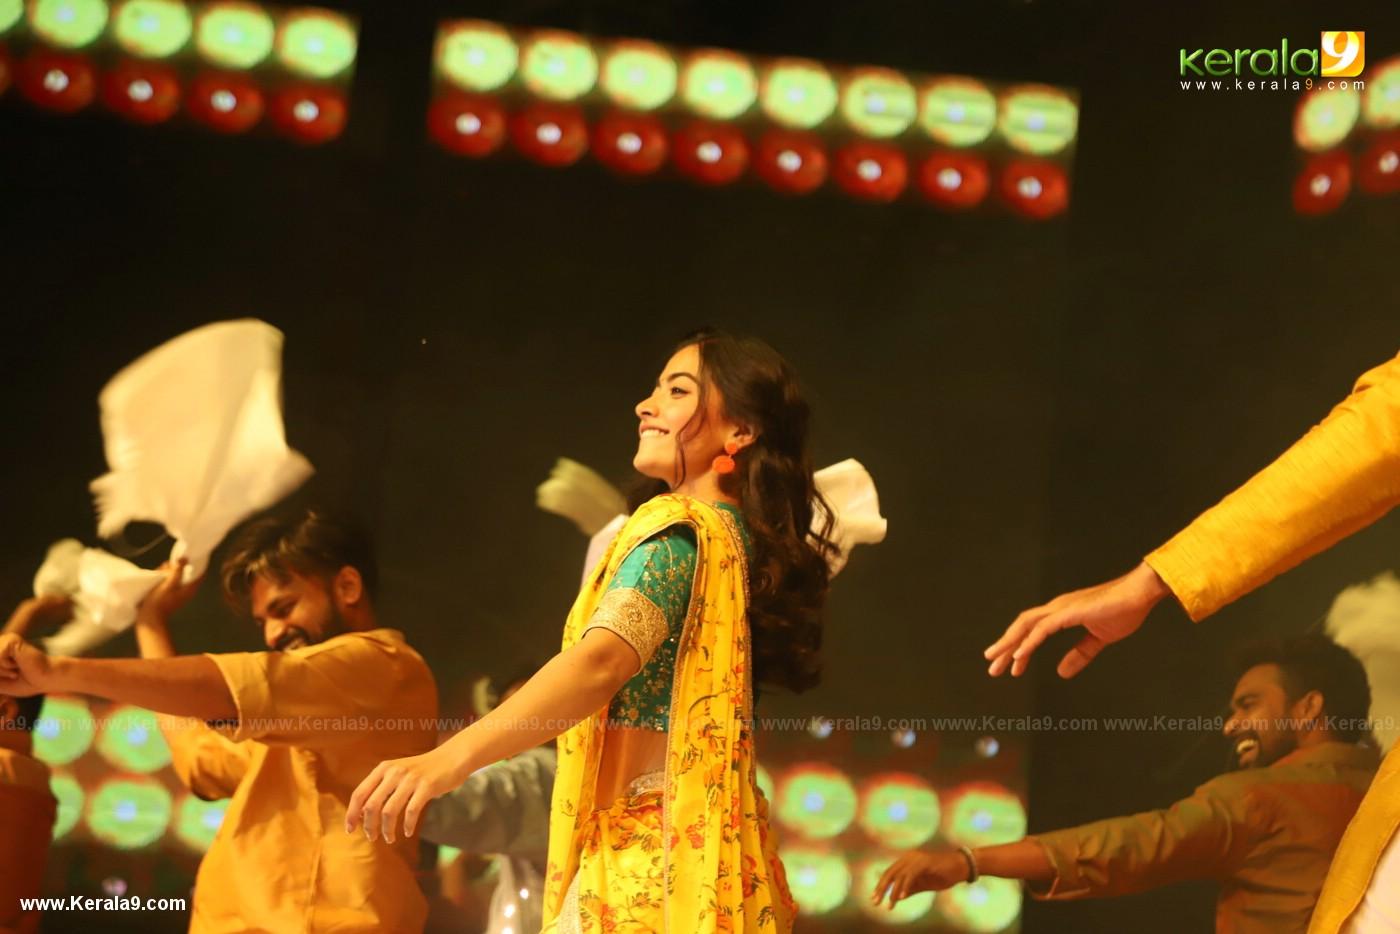 Dear Comrade movie premotion kerala kochi photos 161 - Kerala9.com